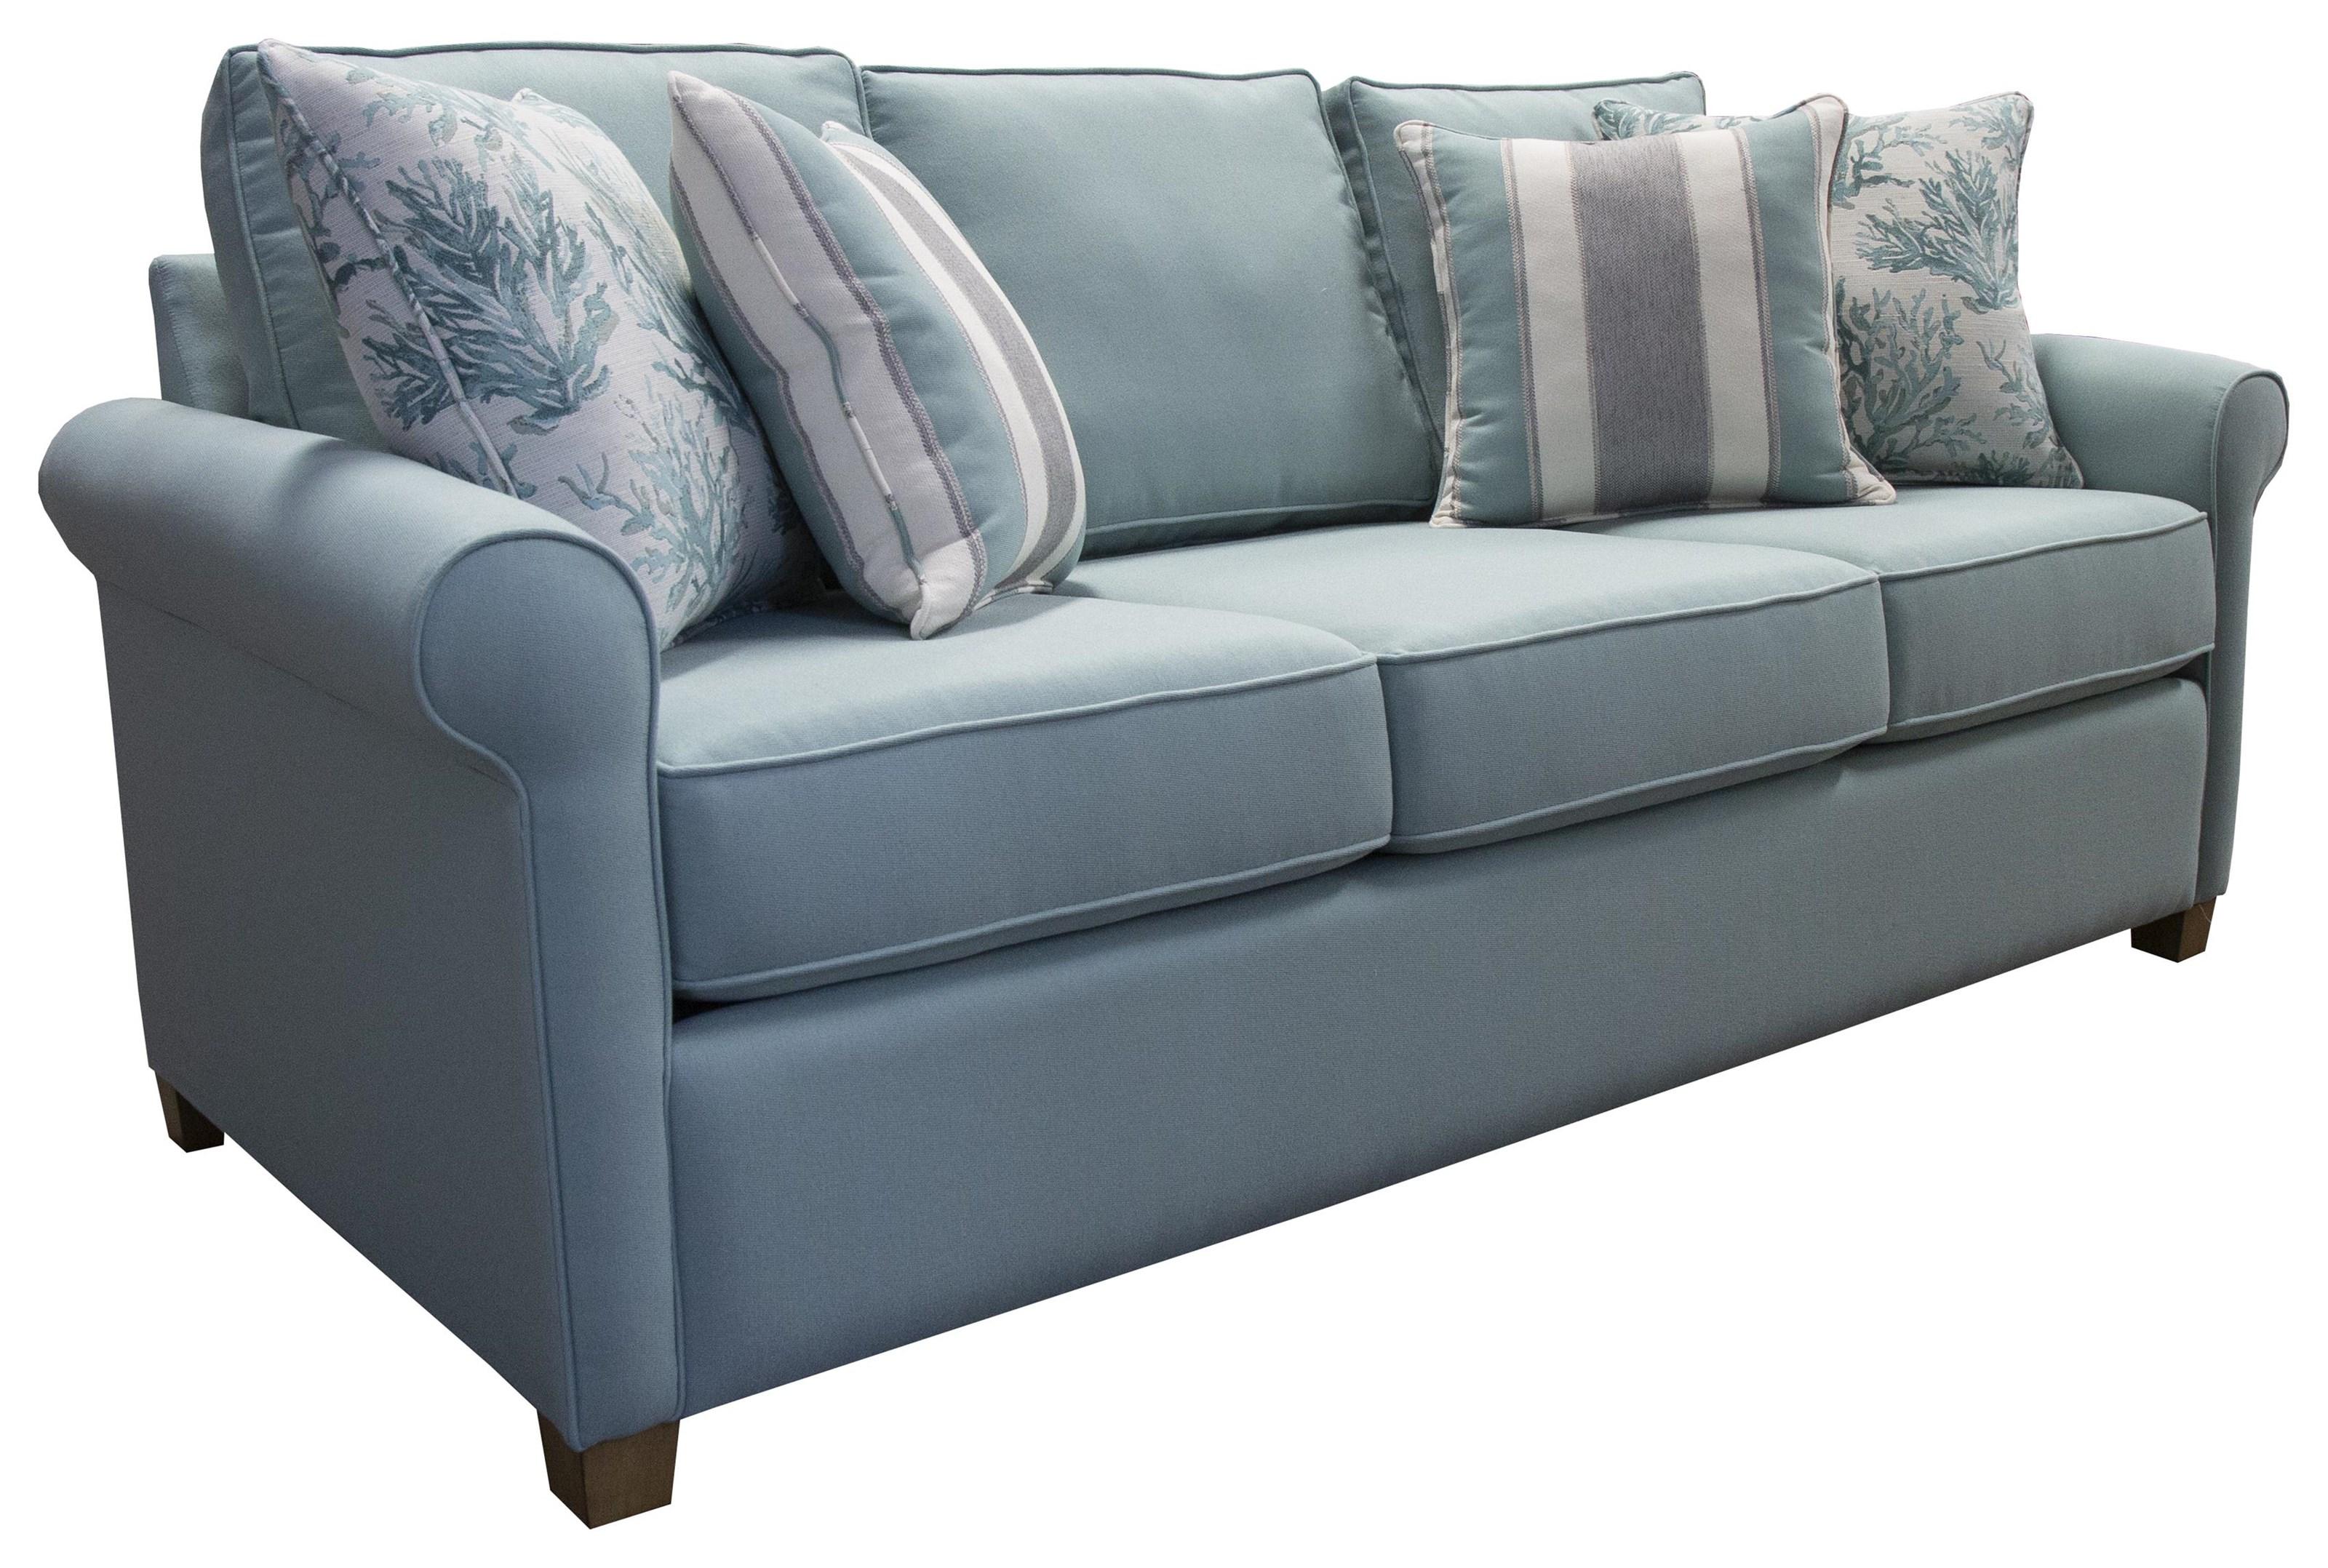 Capris 411 Capris Queen Sleeper by Capris Furniture at Baer's Furniture